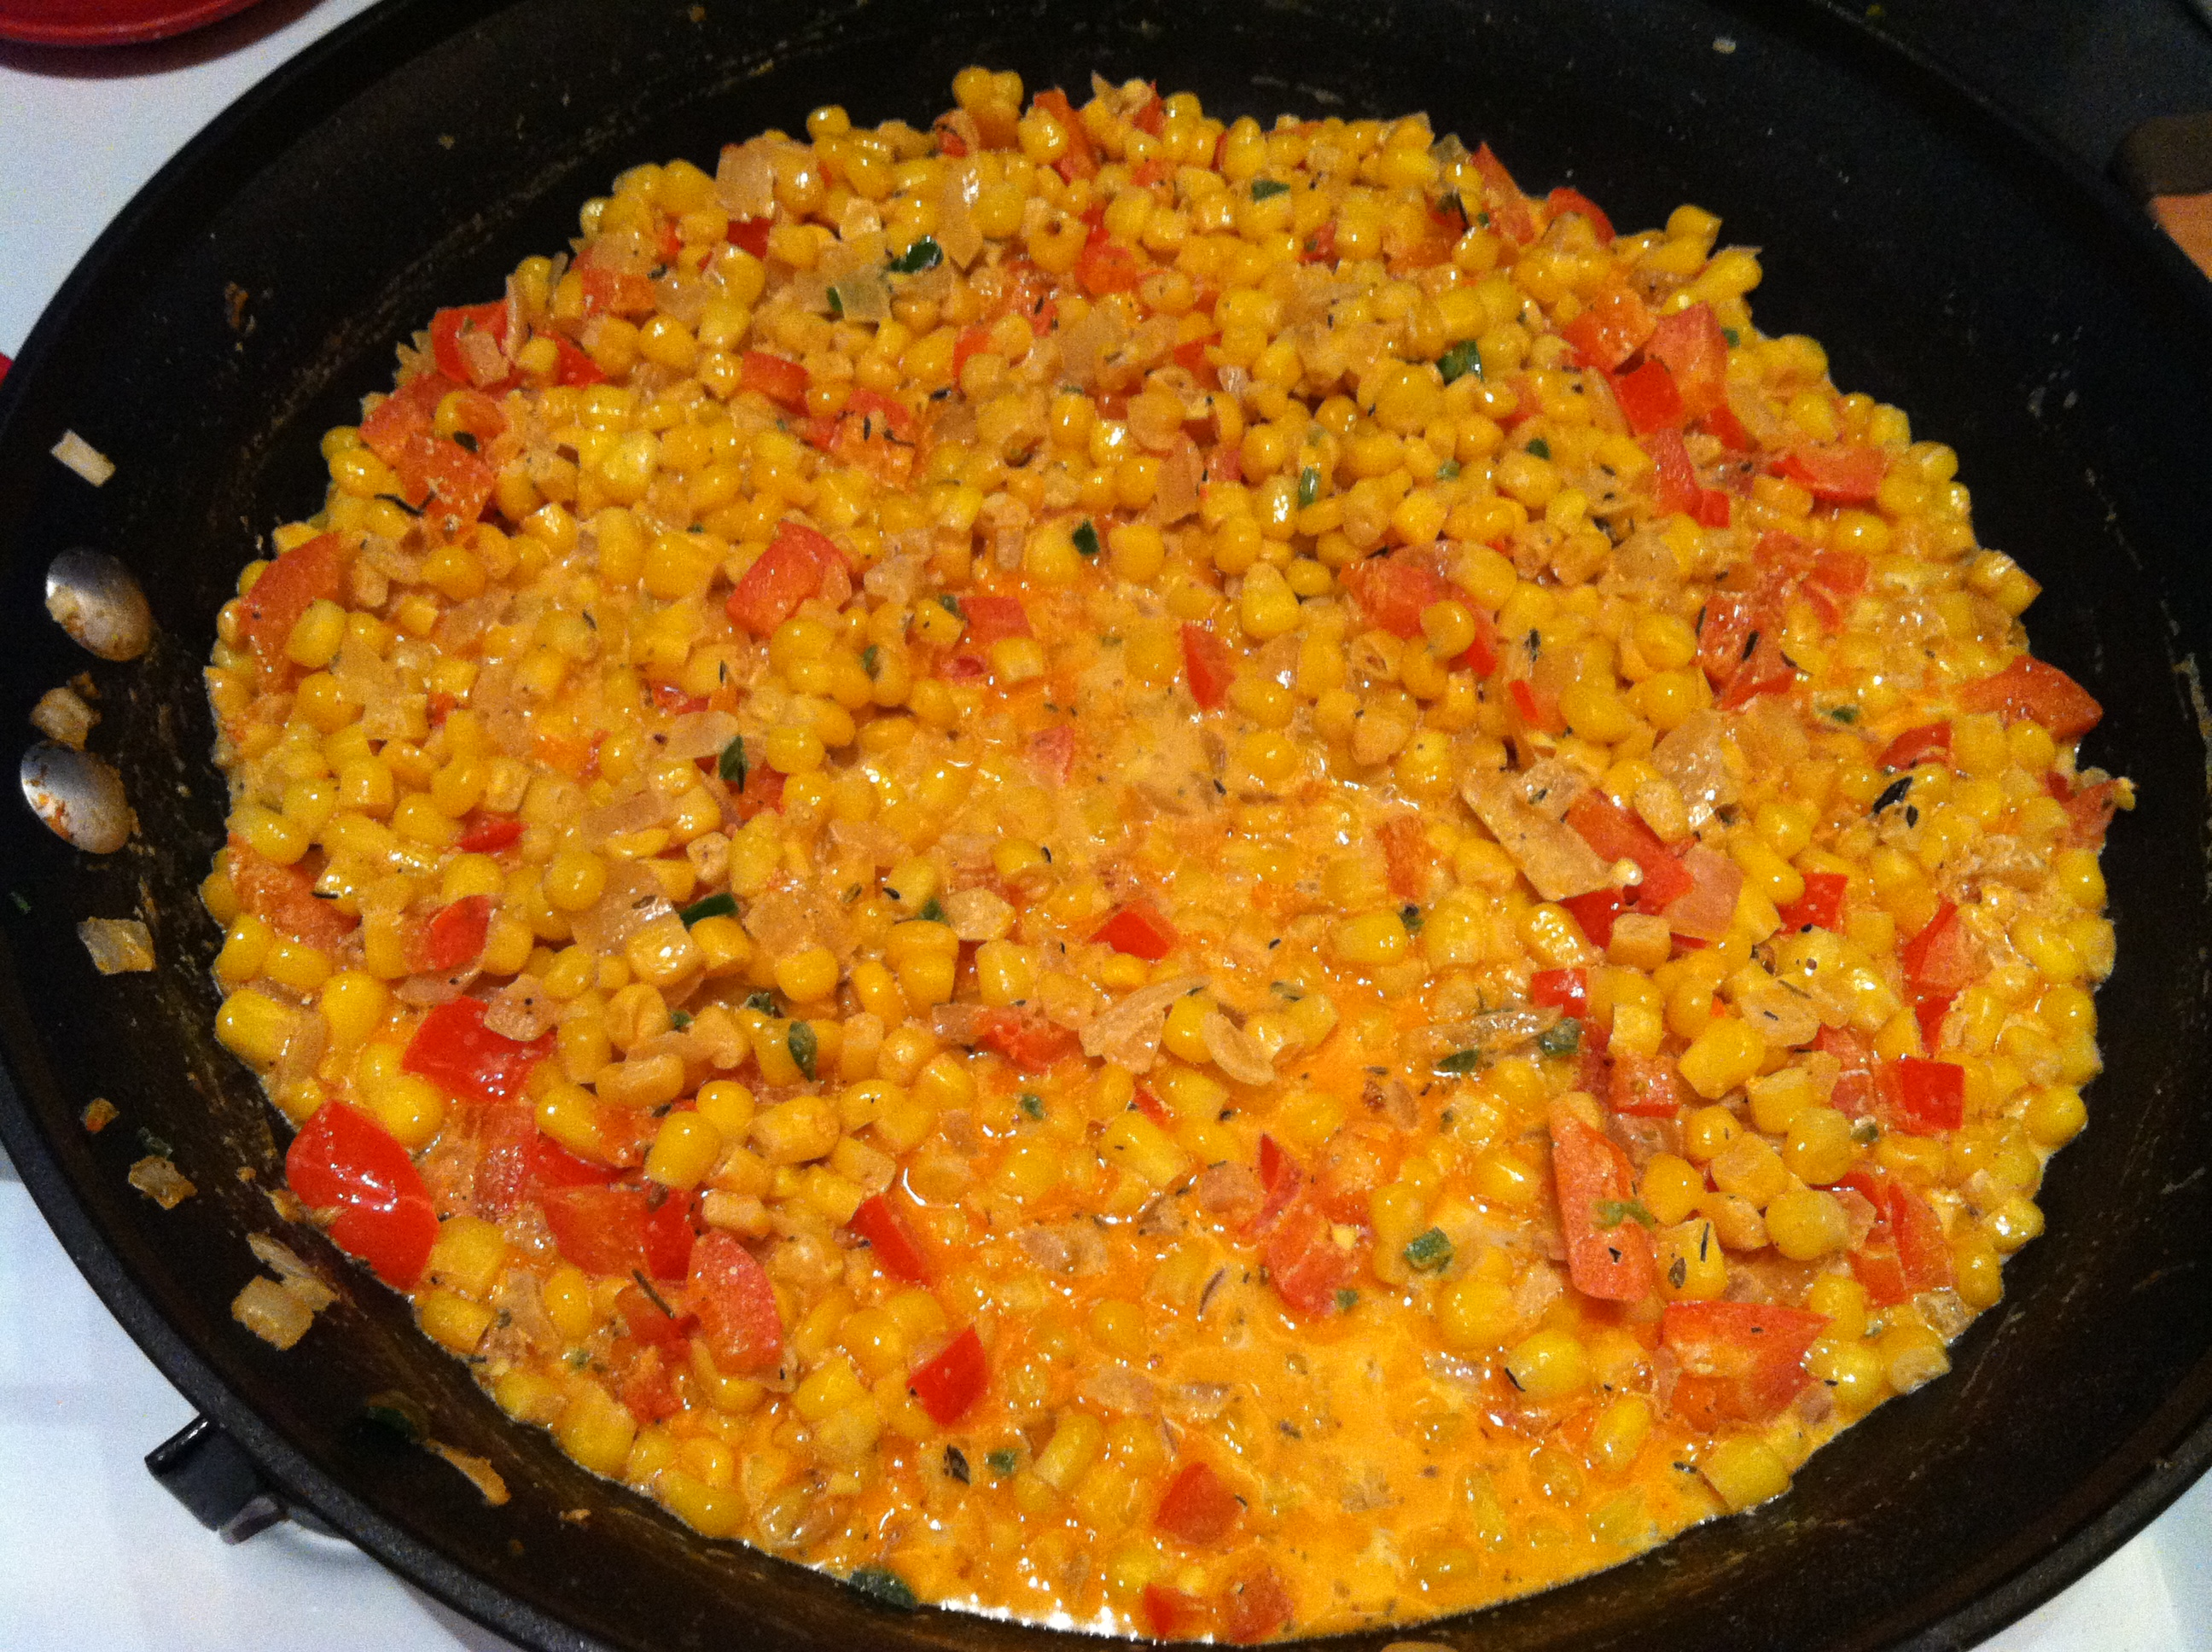 Cooking Club: Mardi Gras — Vegan Corn Maque Choux